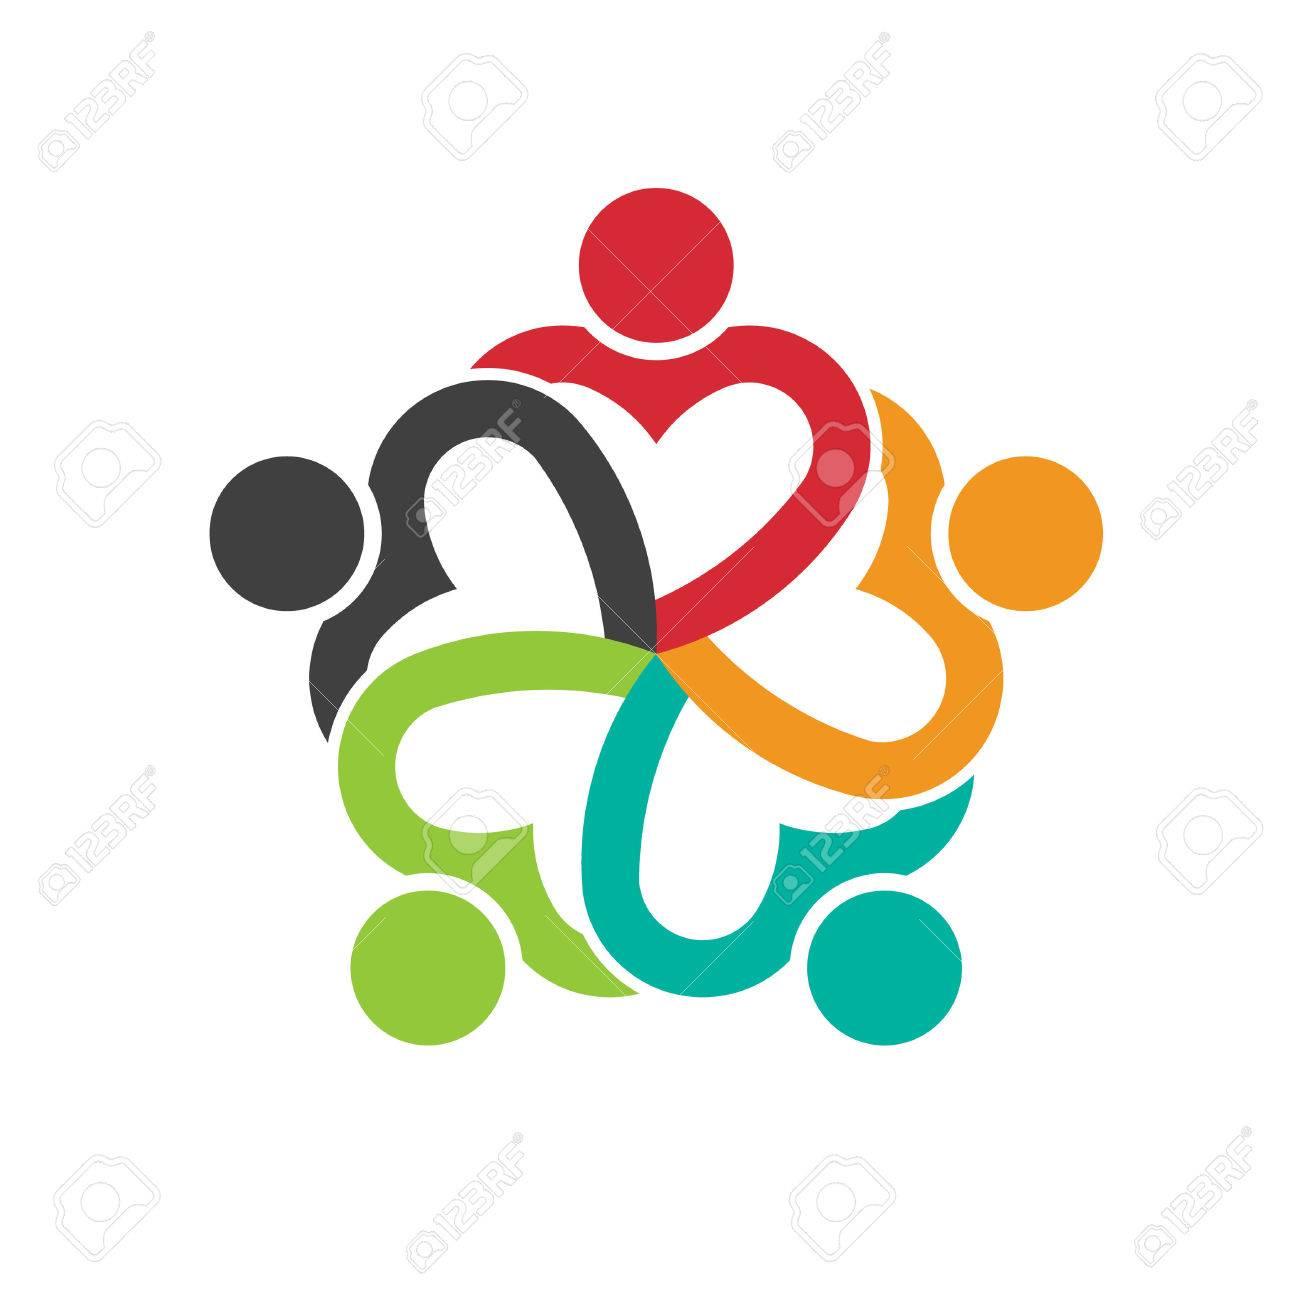 Teamwork 5 heart people social friendship - 37357056